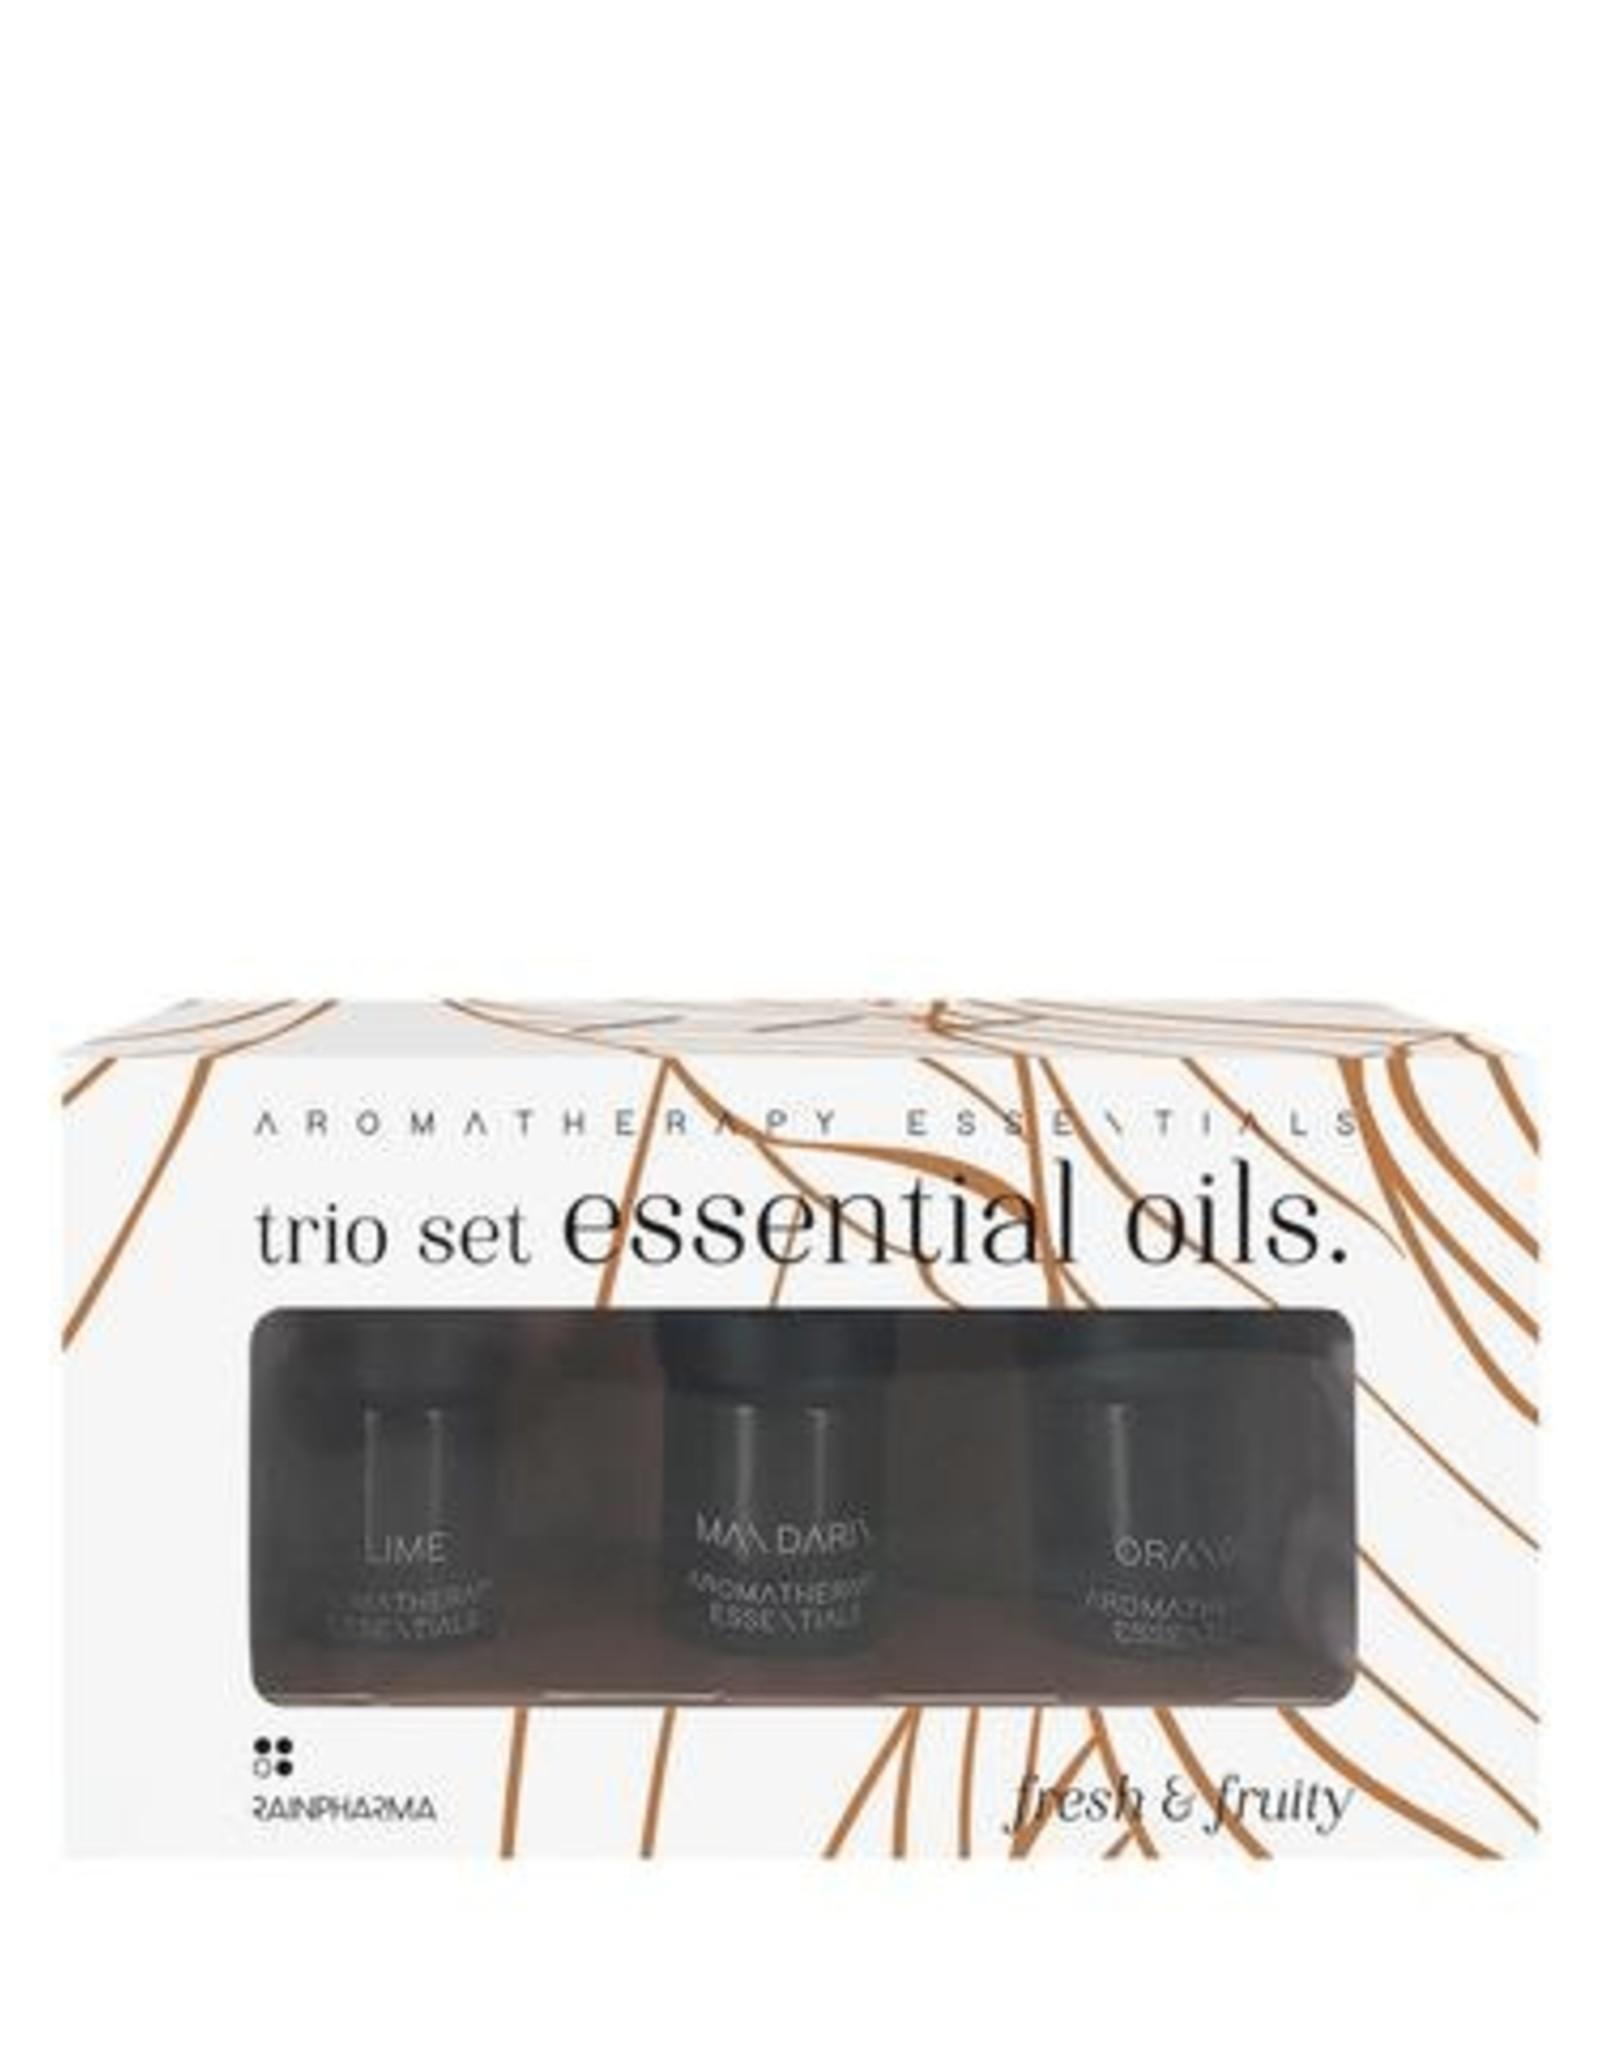 RainPharma Rainpharma - Trio Essential Oils - Fresh & Fruity